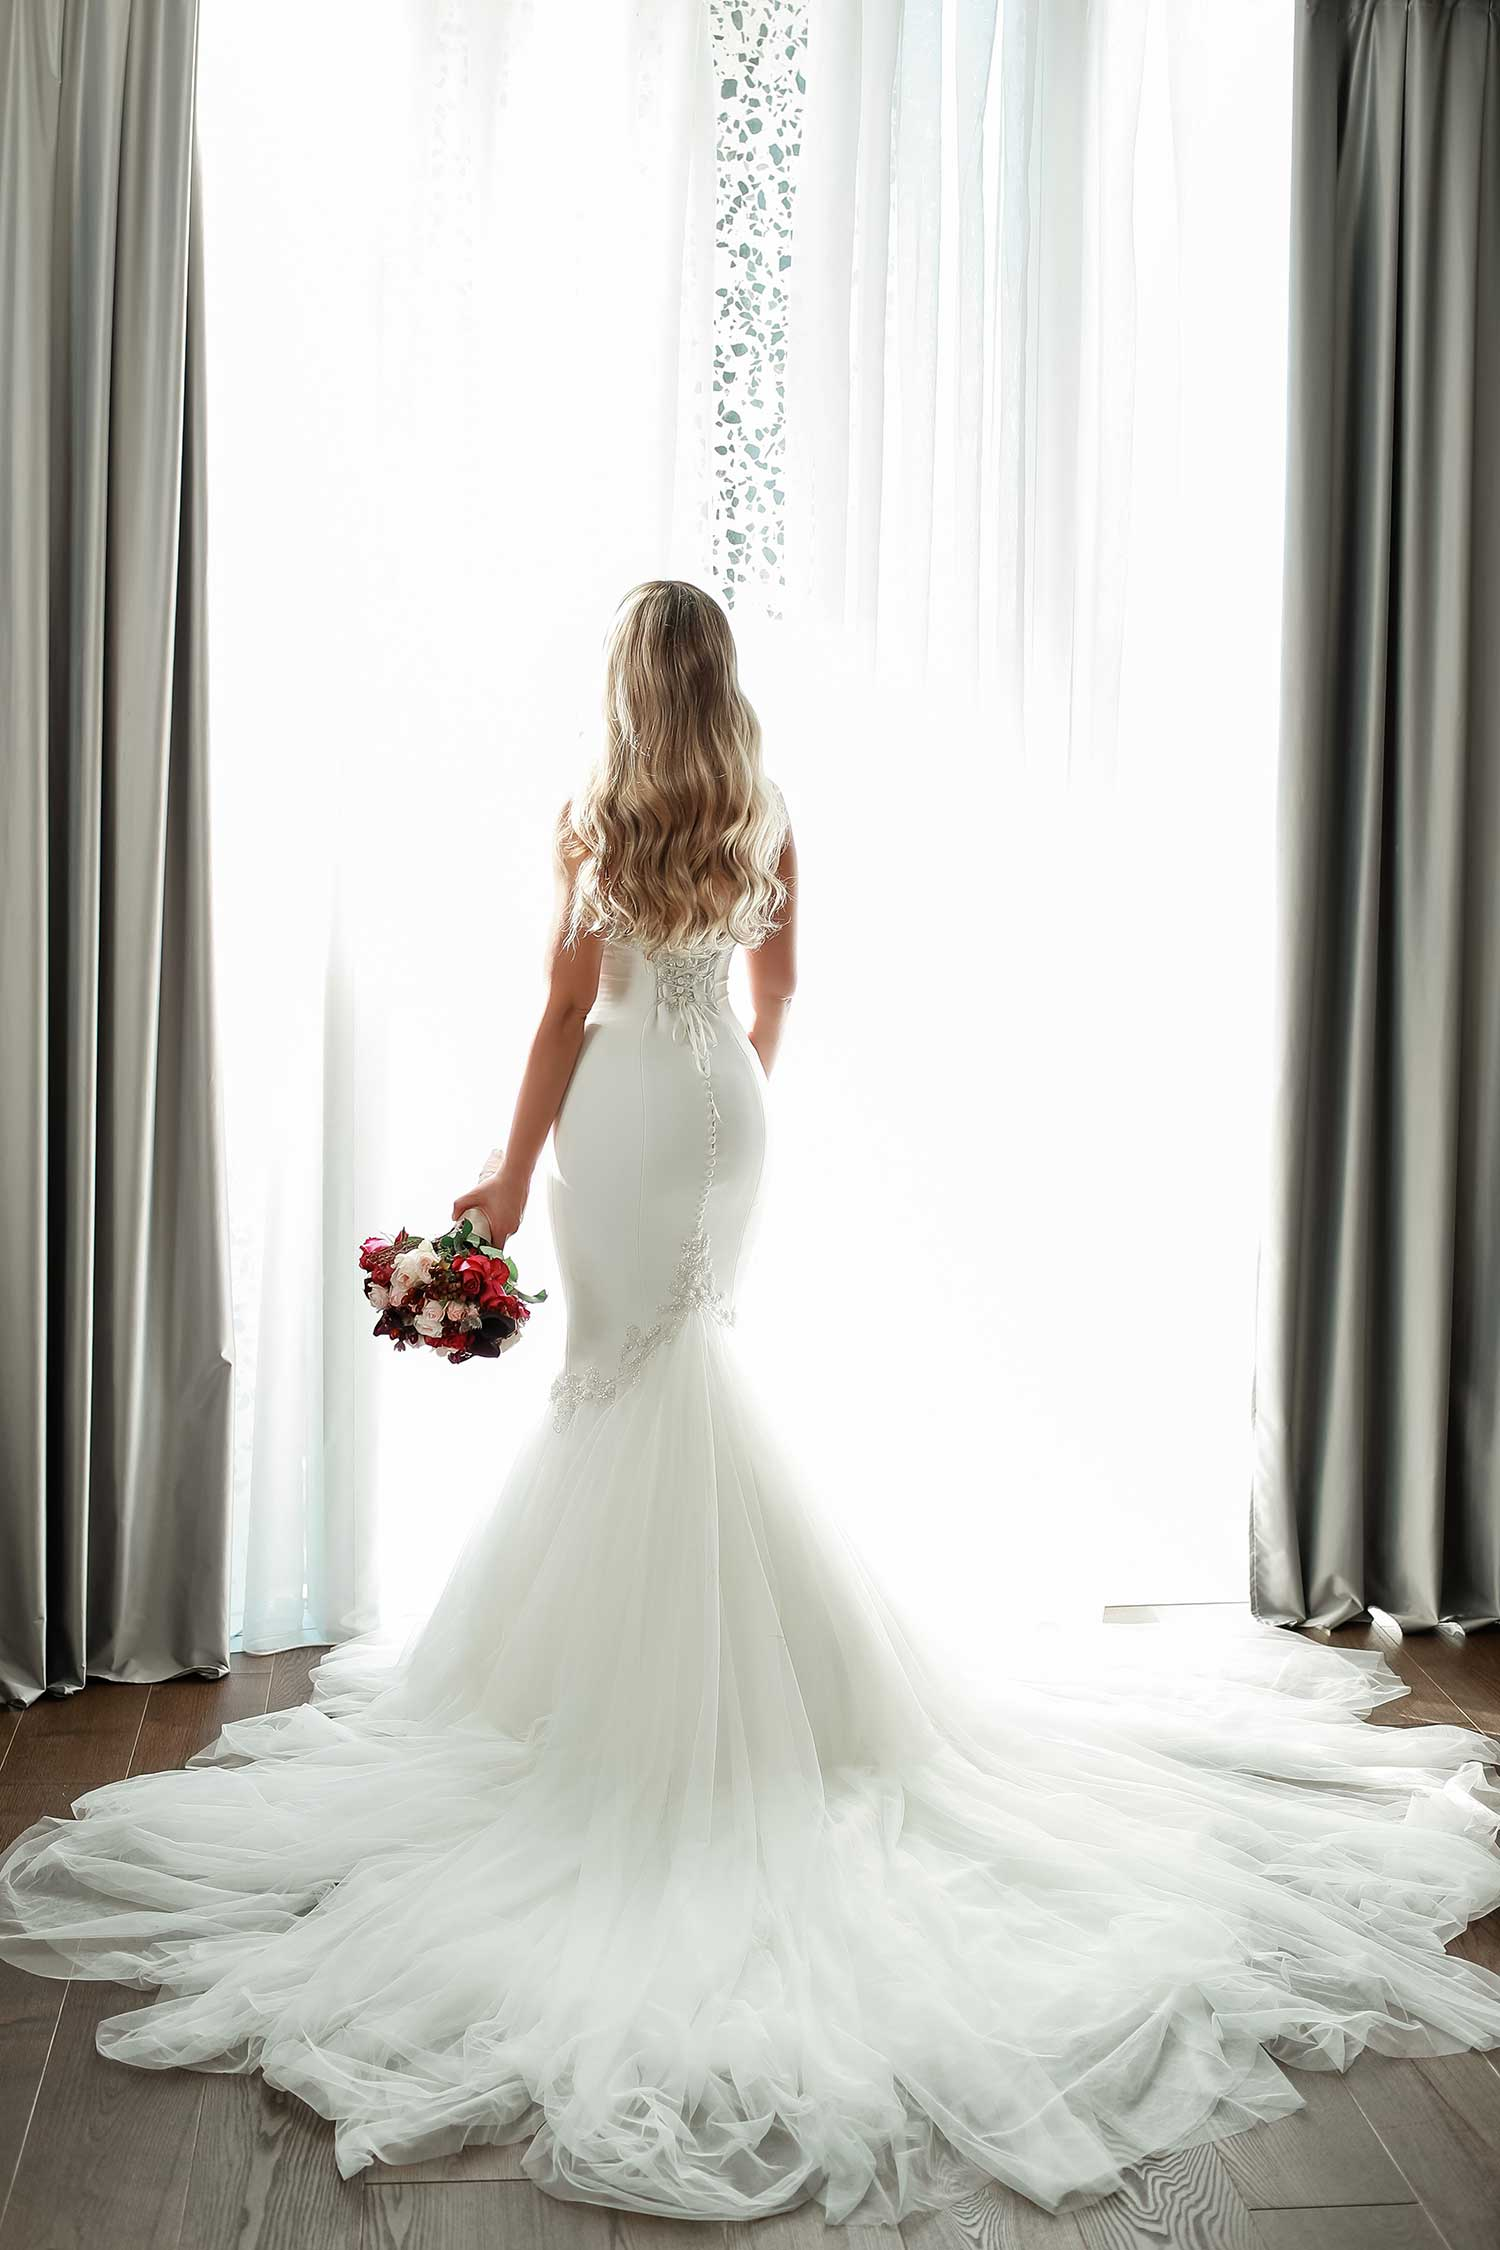 Perfect white wedding dress